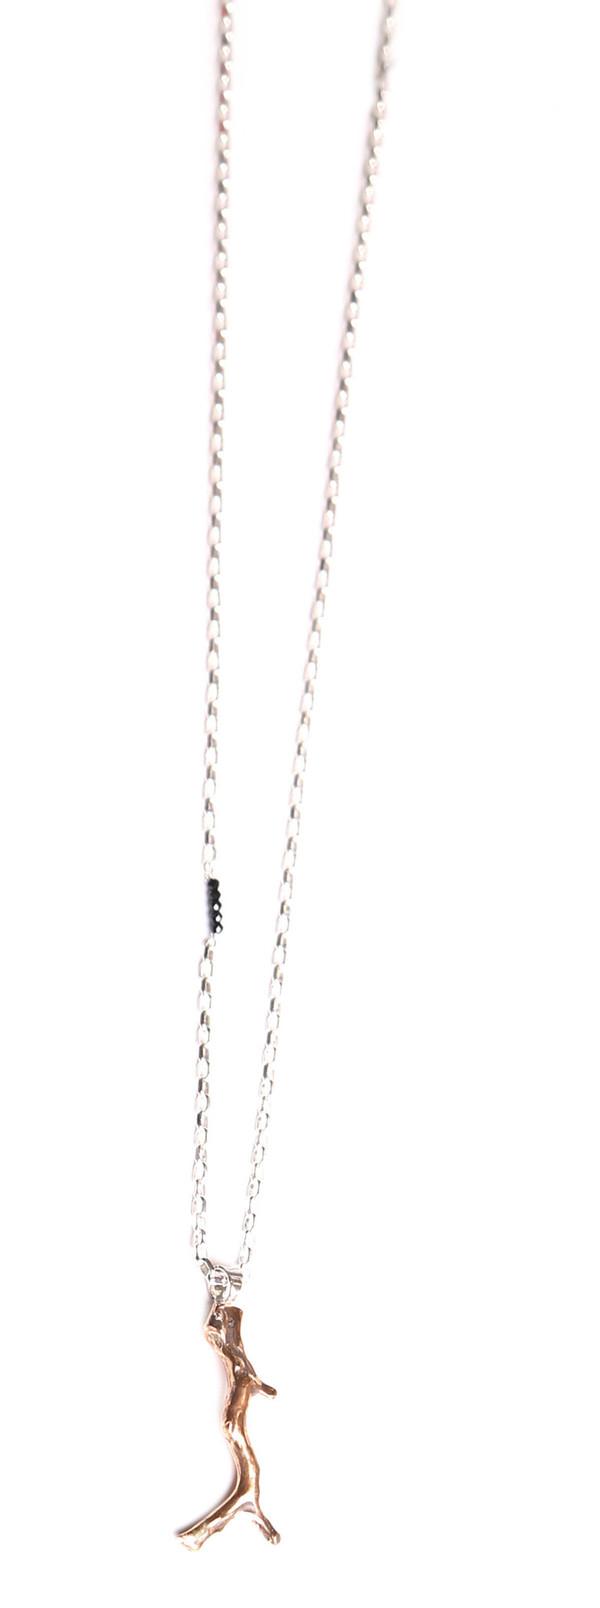 Sarah Dunn Coral Bronze Pendant Necklace